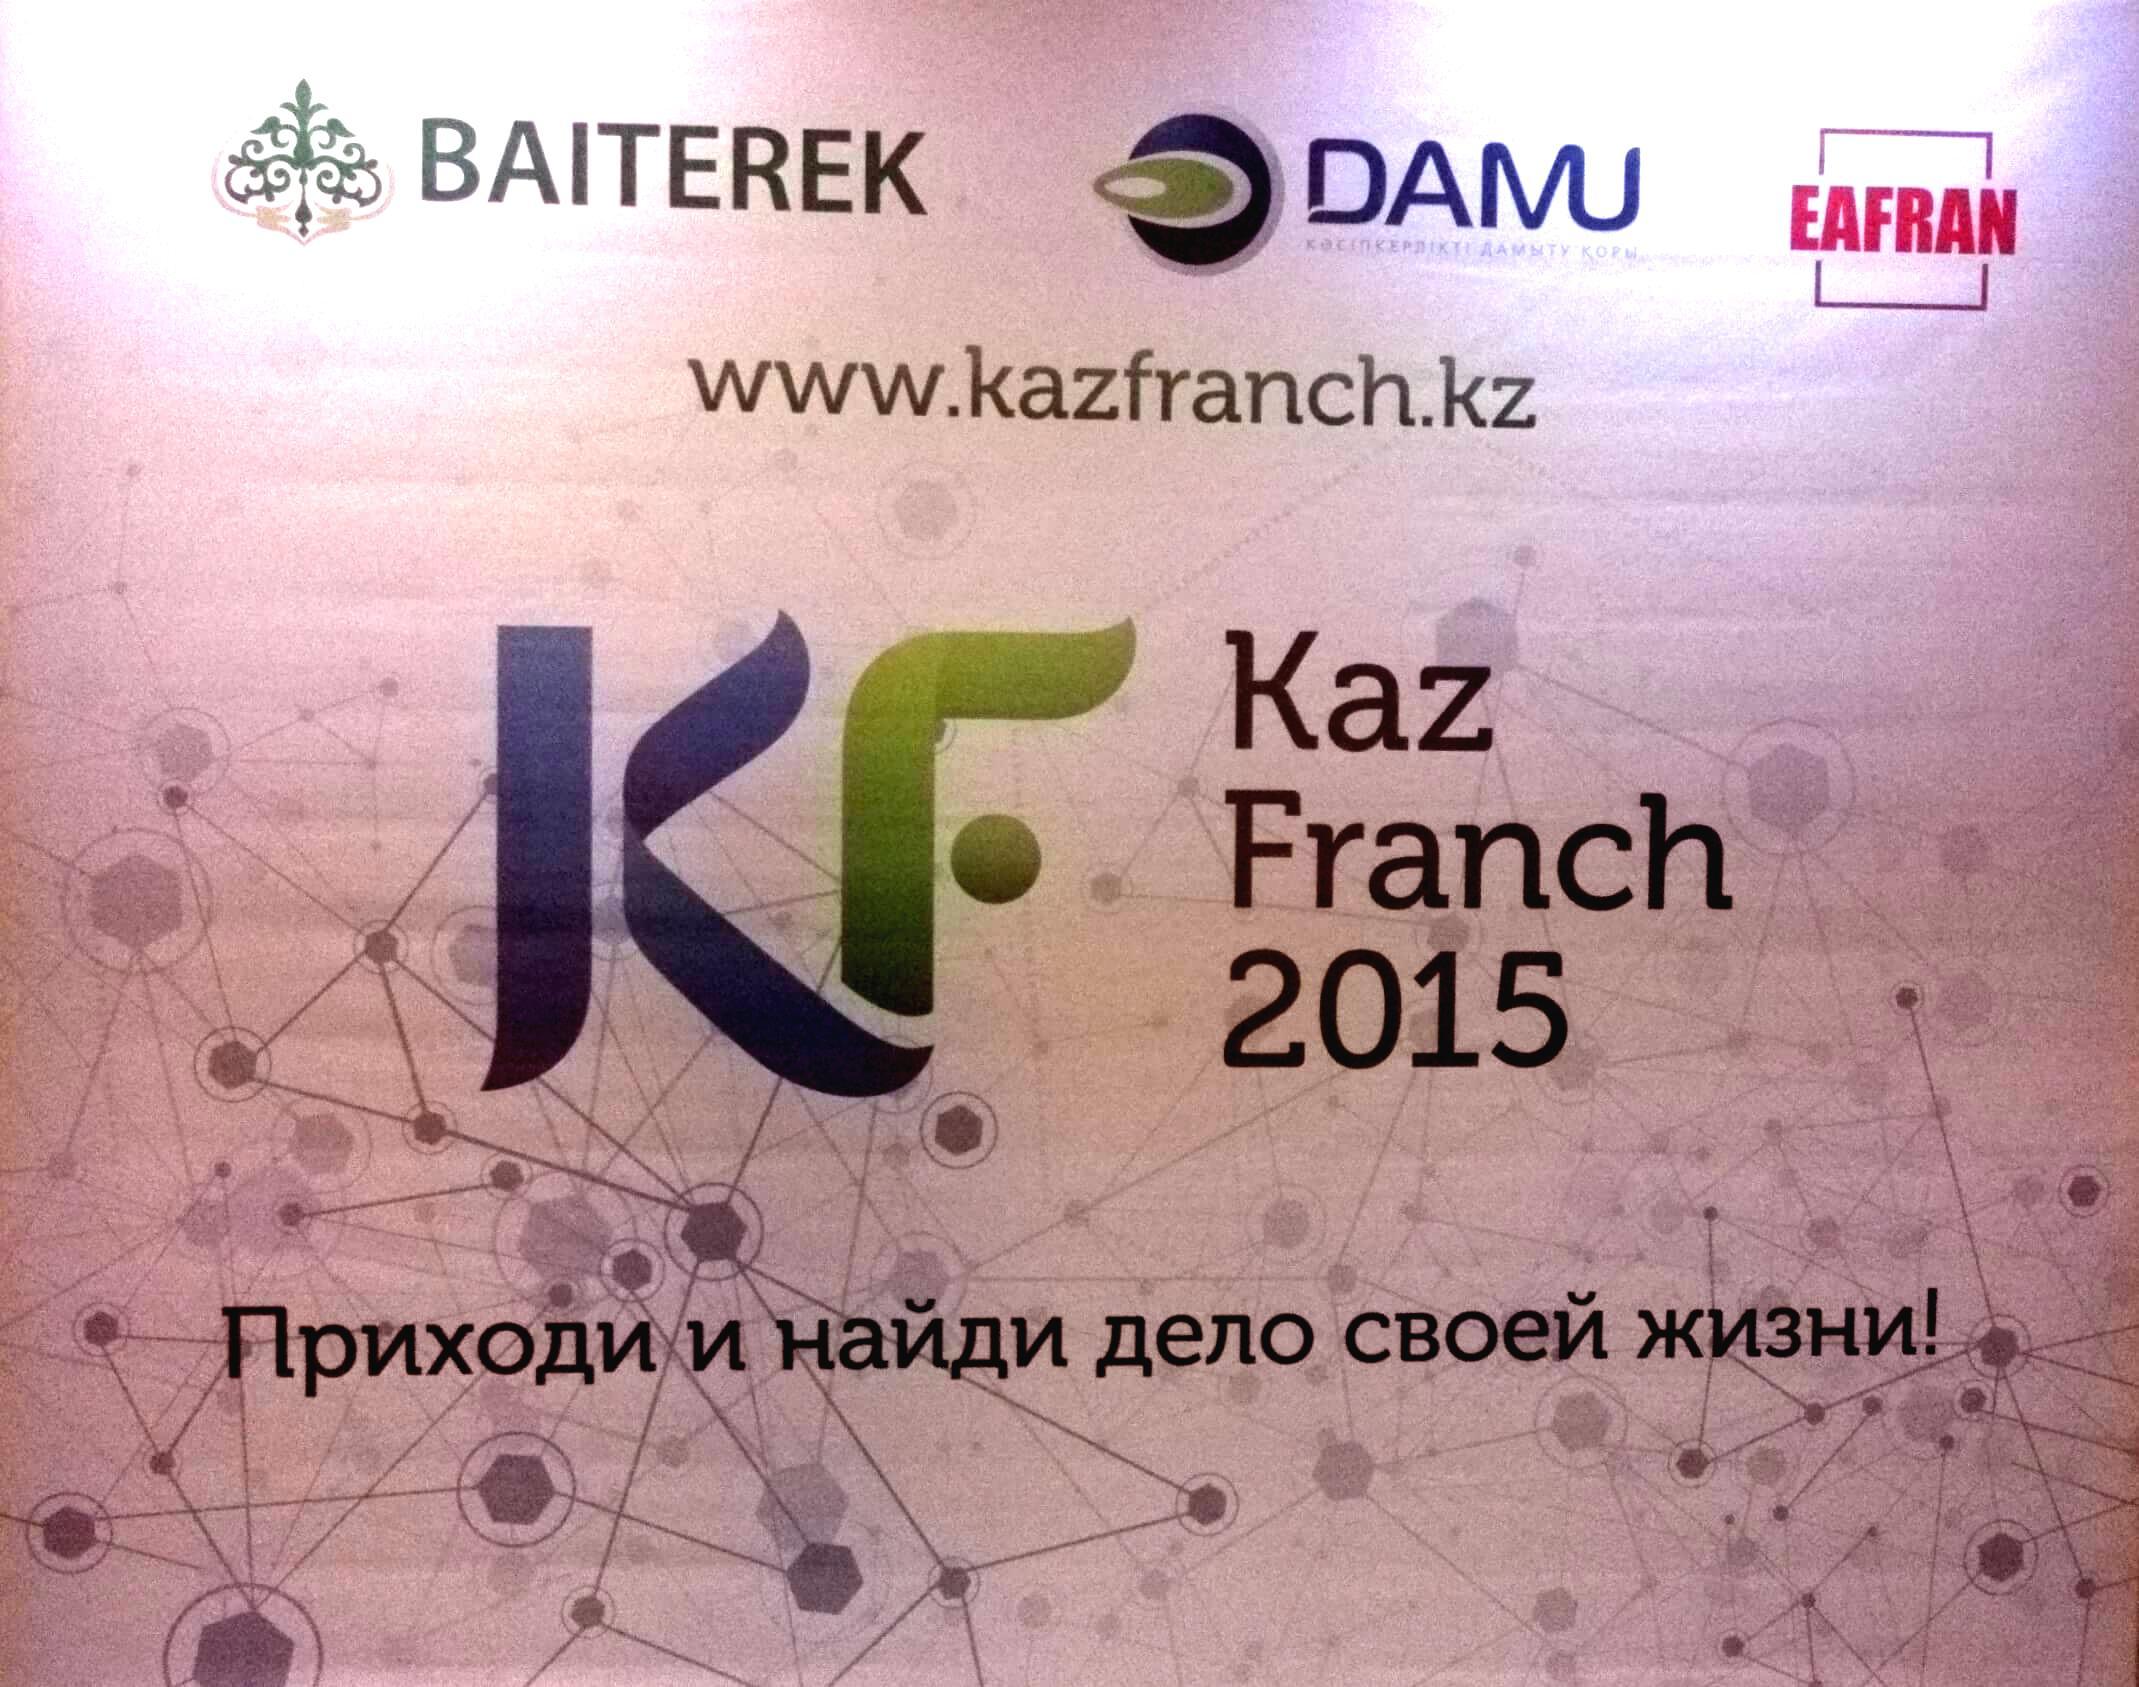 The third Kazakhstan exhibition on franchising.